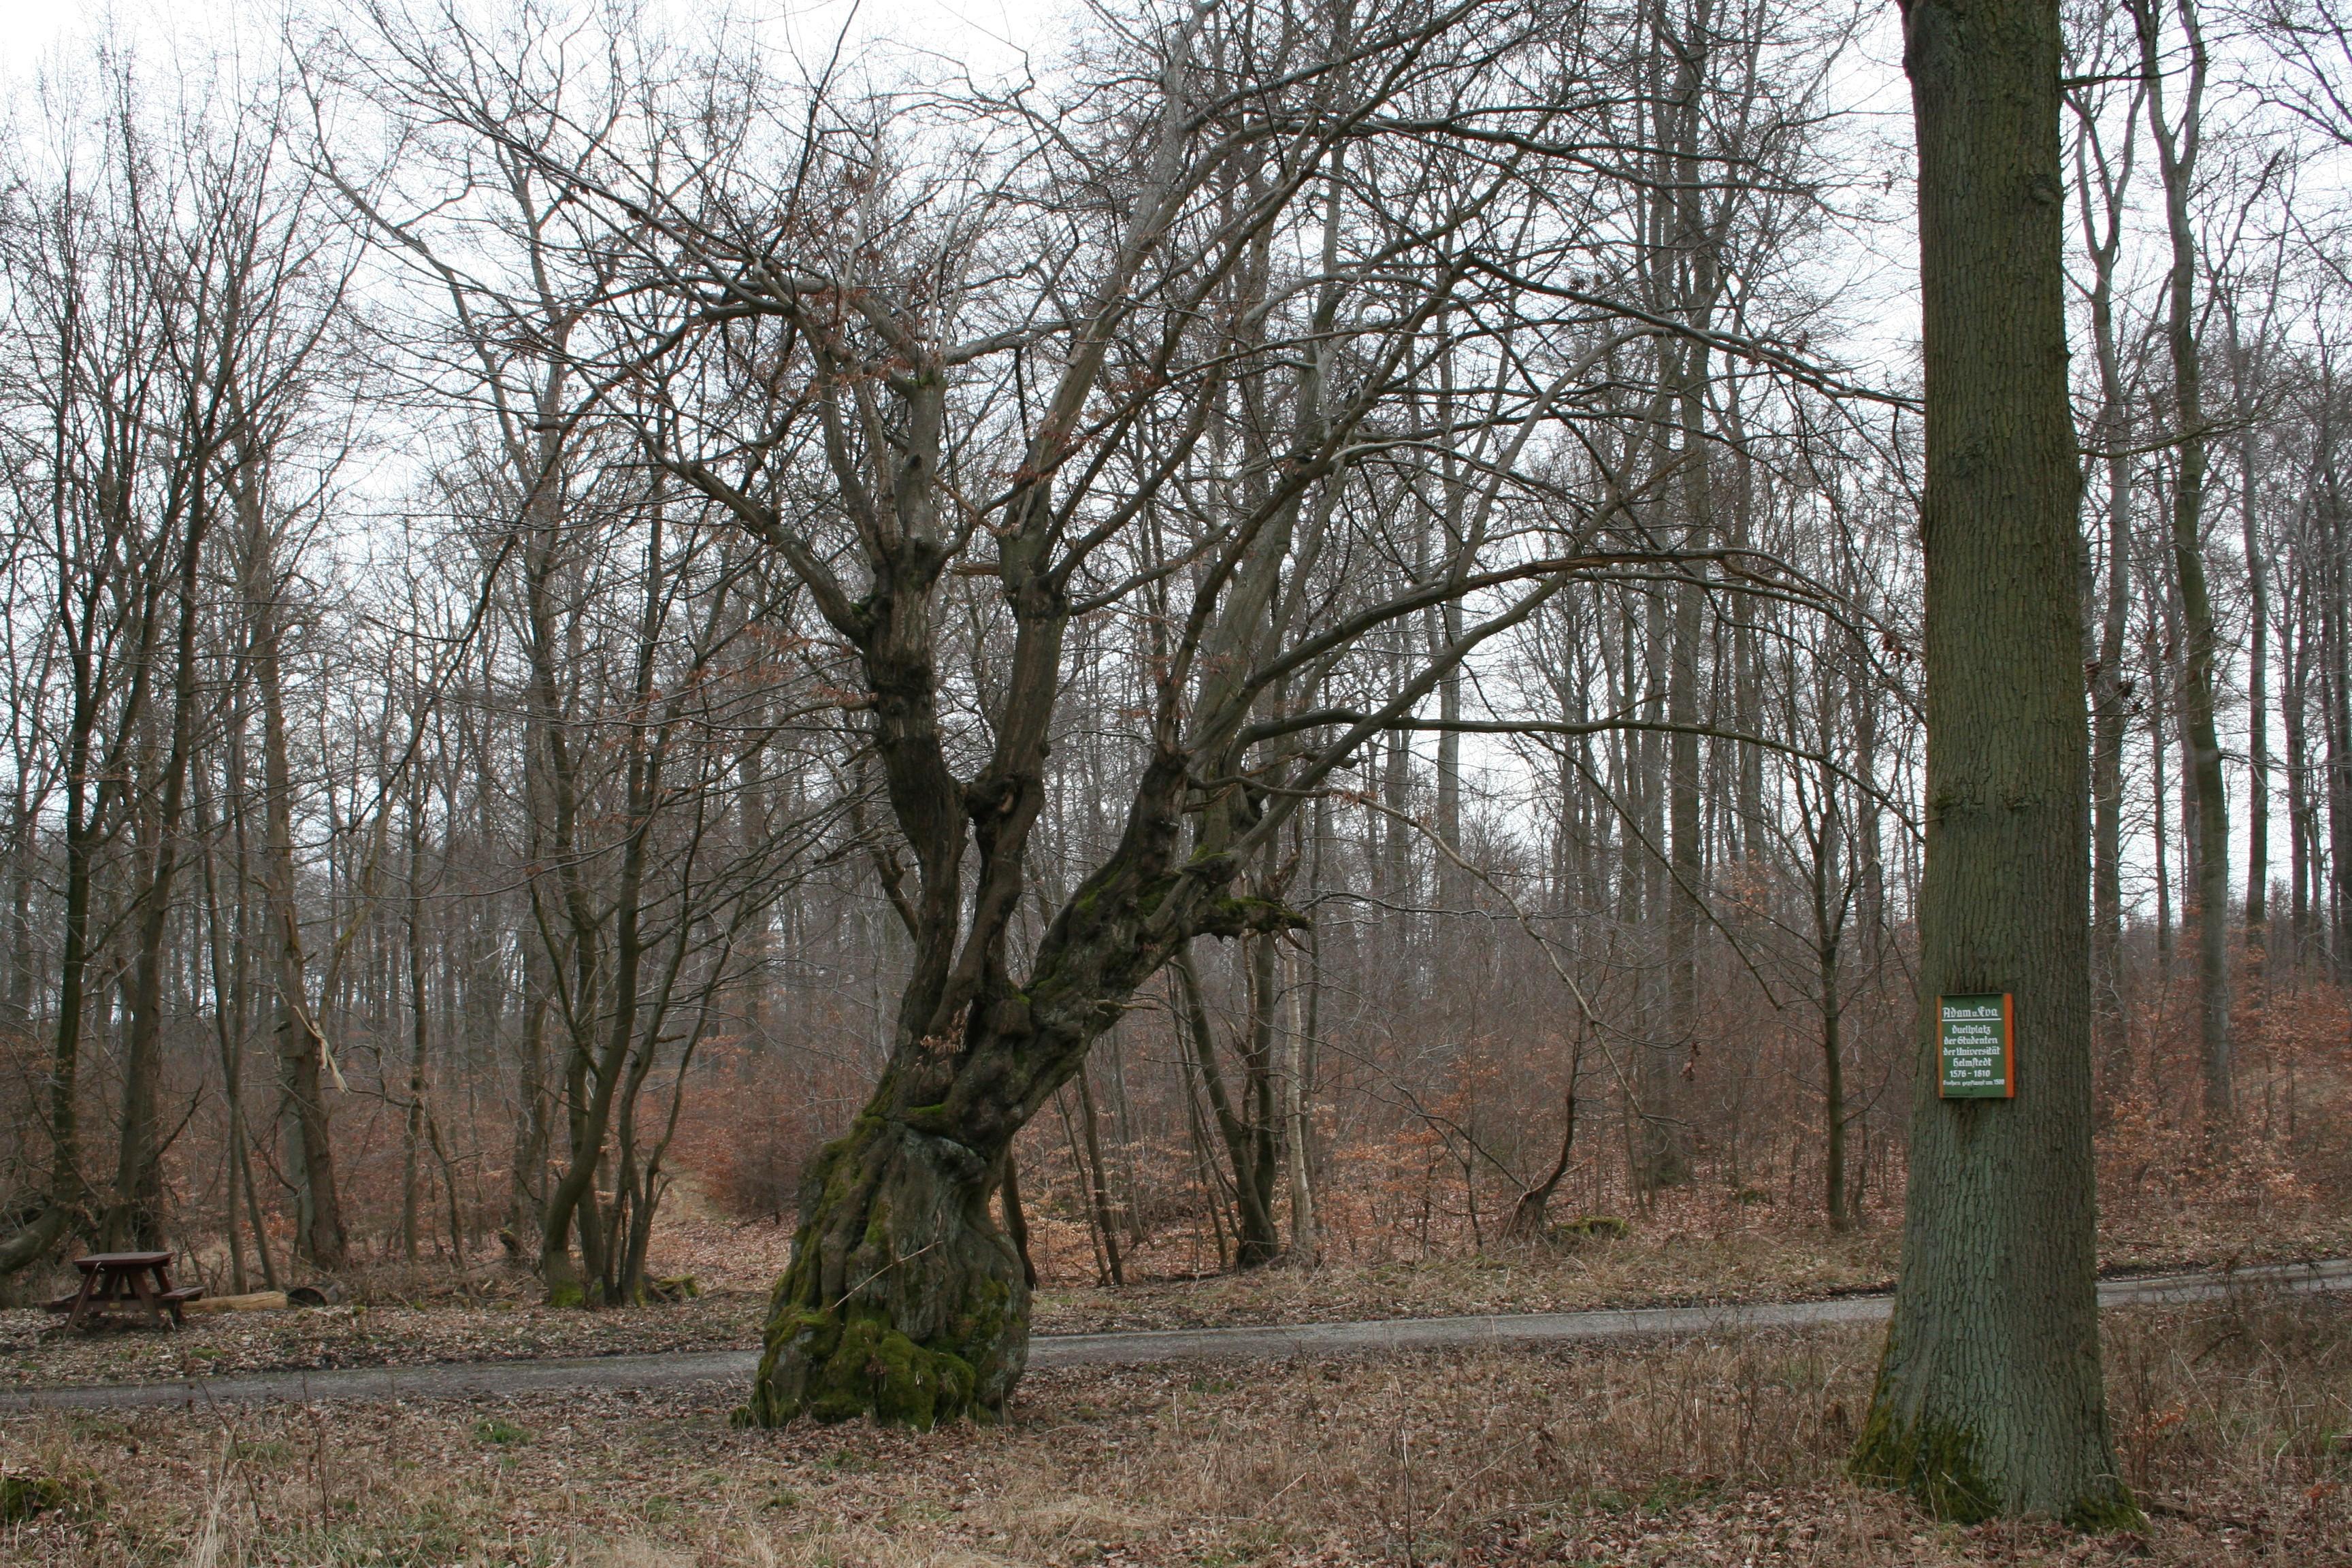 Bäume - Baumlexikon mit Baumarten